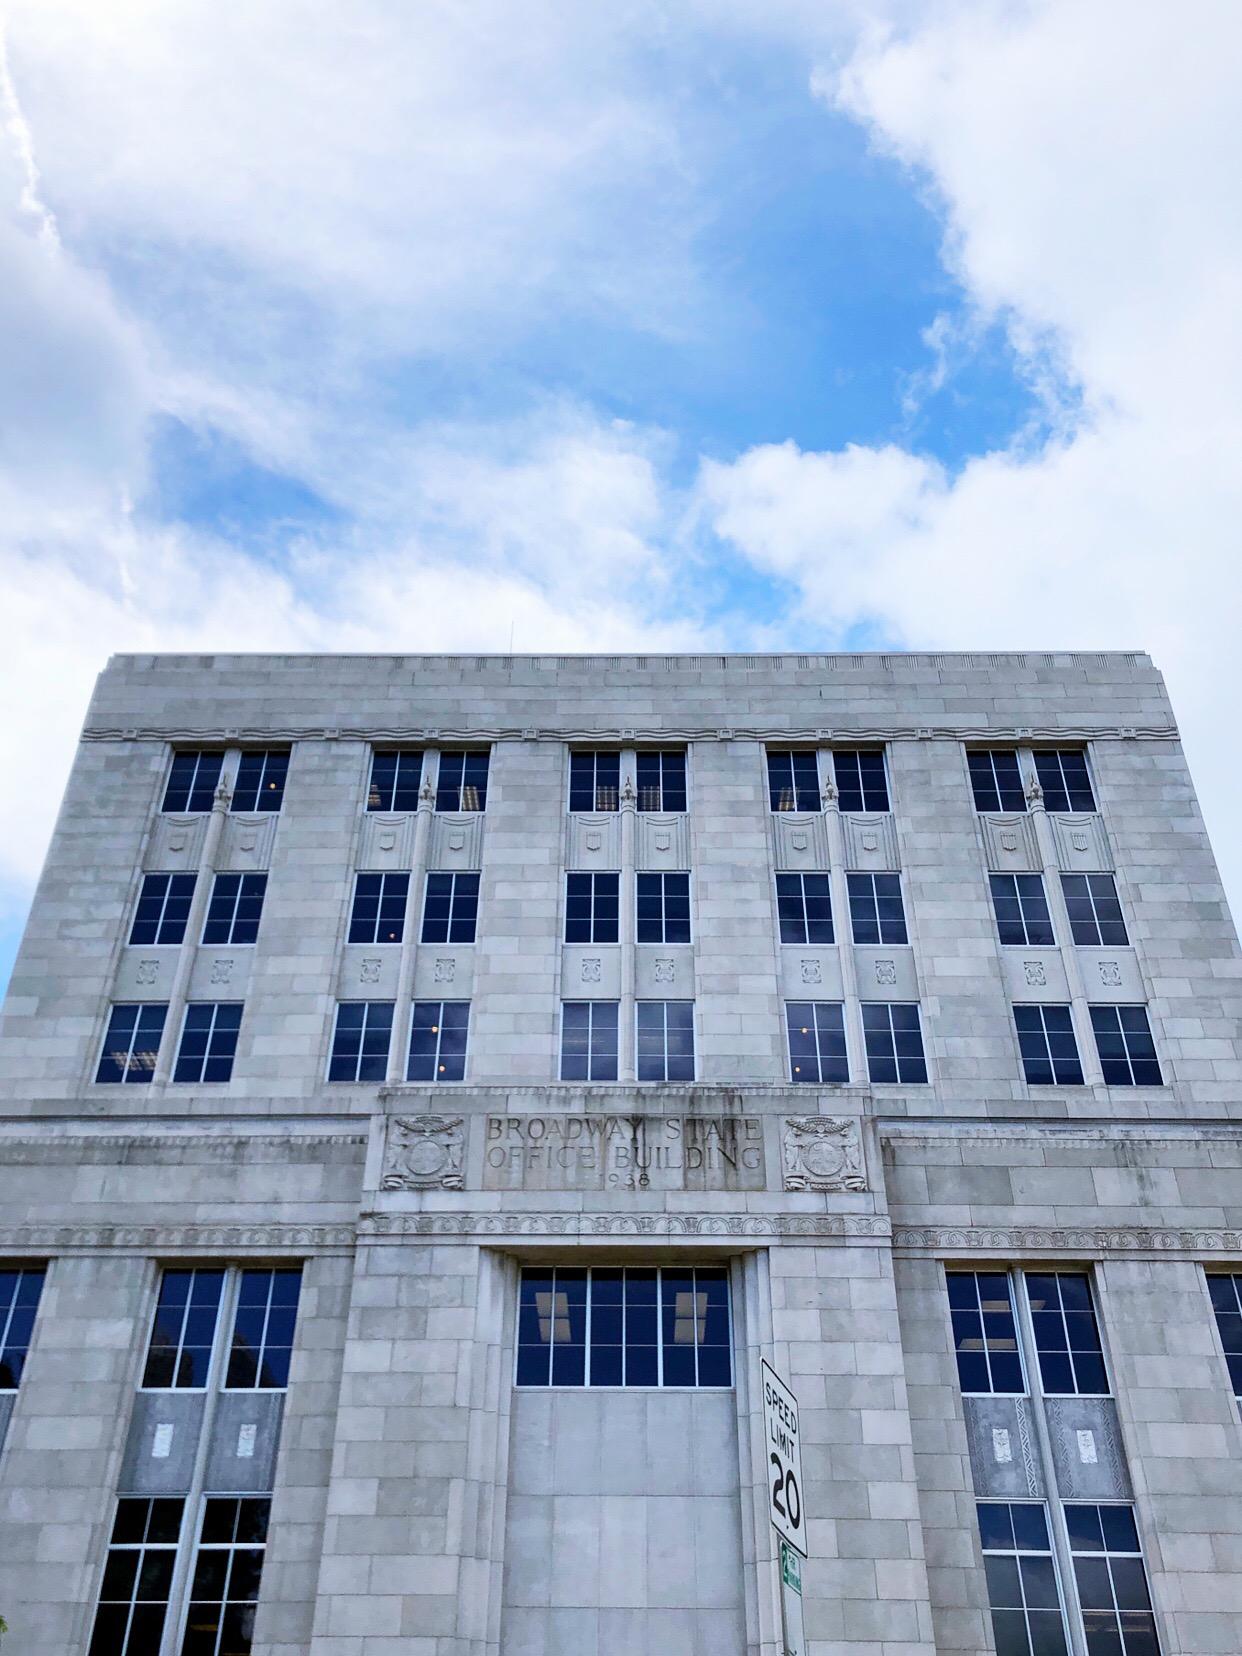 jefferson-city-mo-architecture-downtown-jcmo-jeff-city-broadway-state-office-building